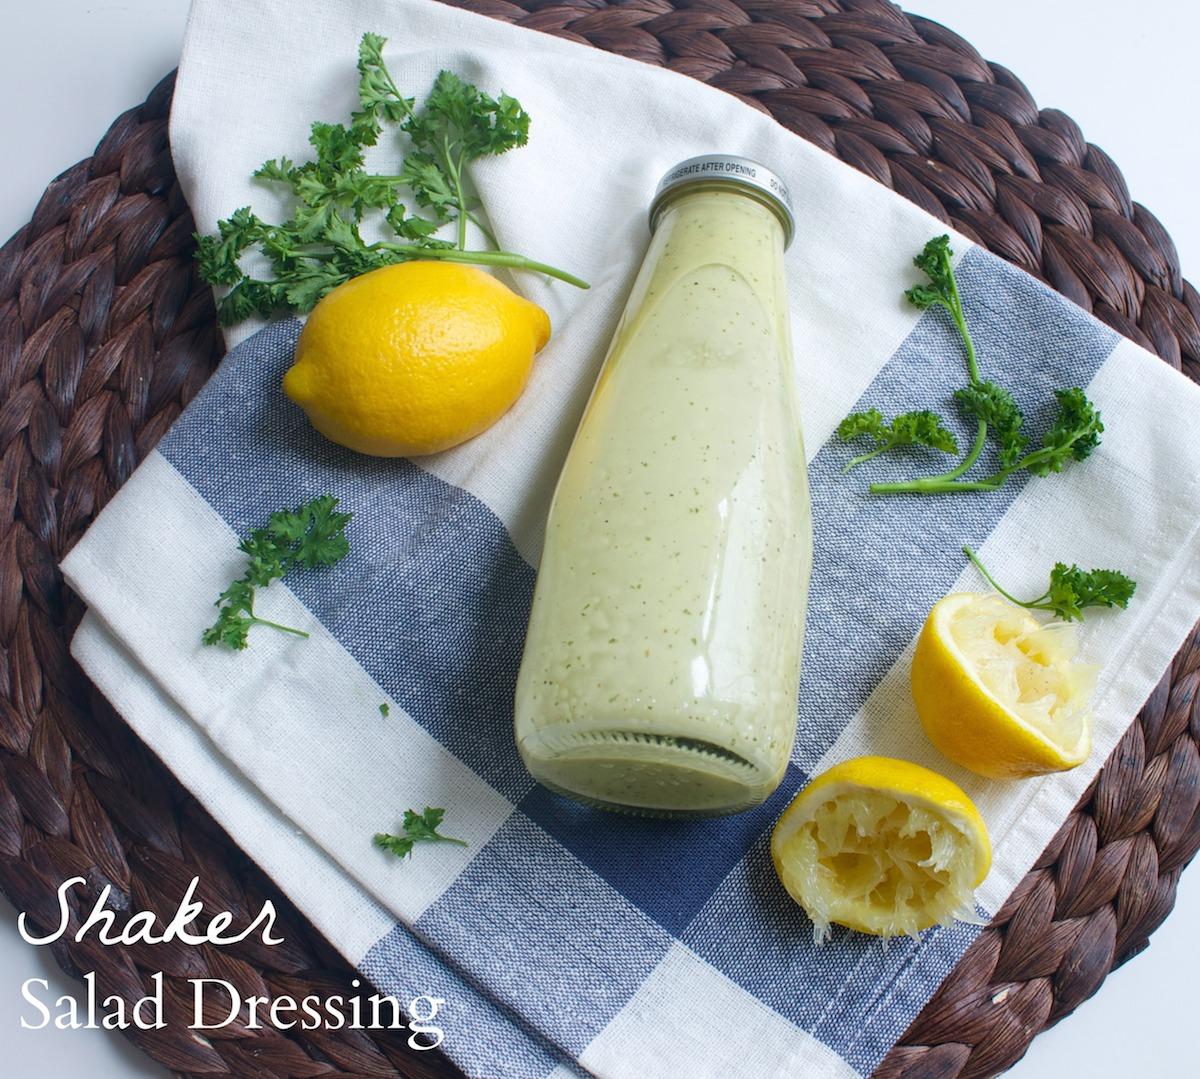 Shaker-Salad-Dressing.jpg